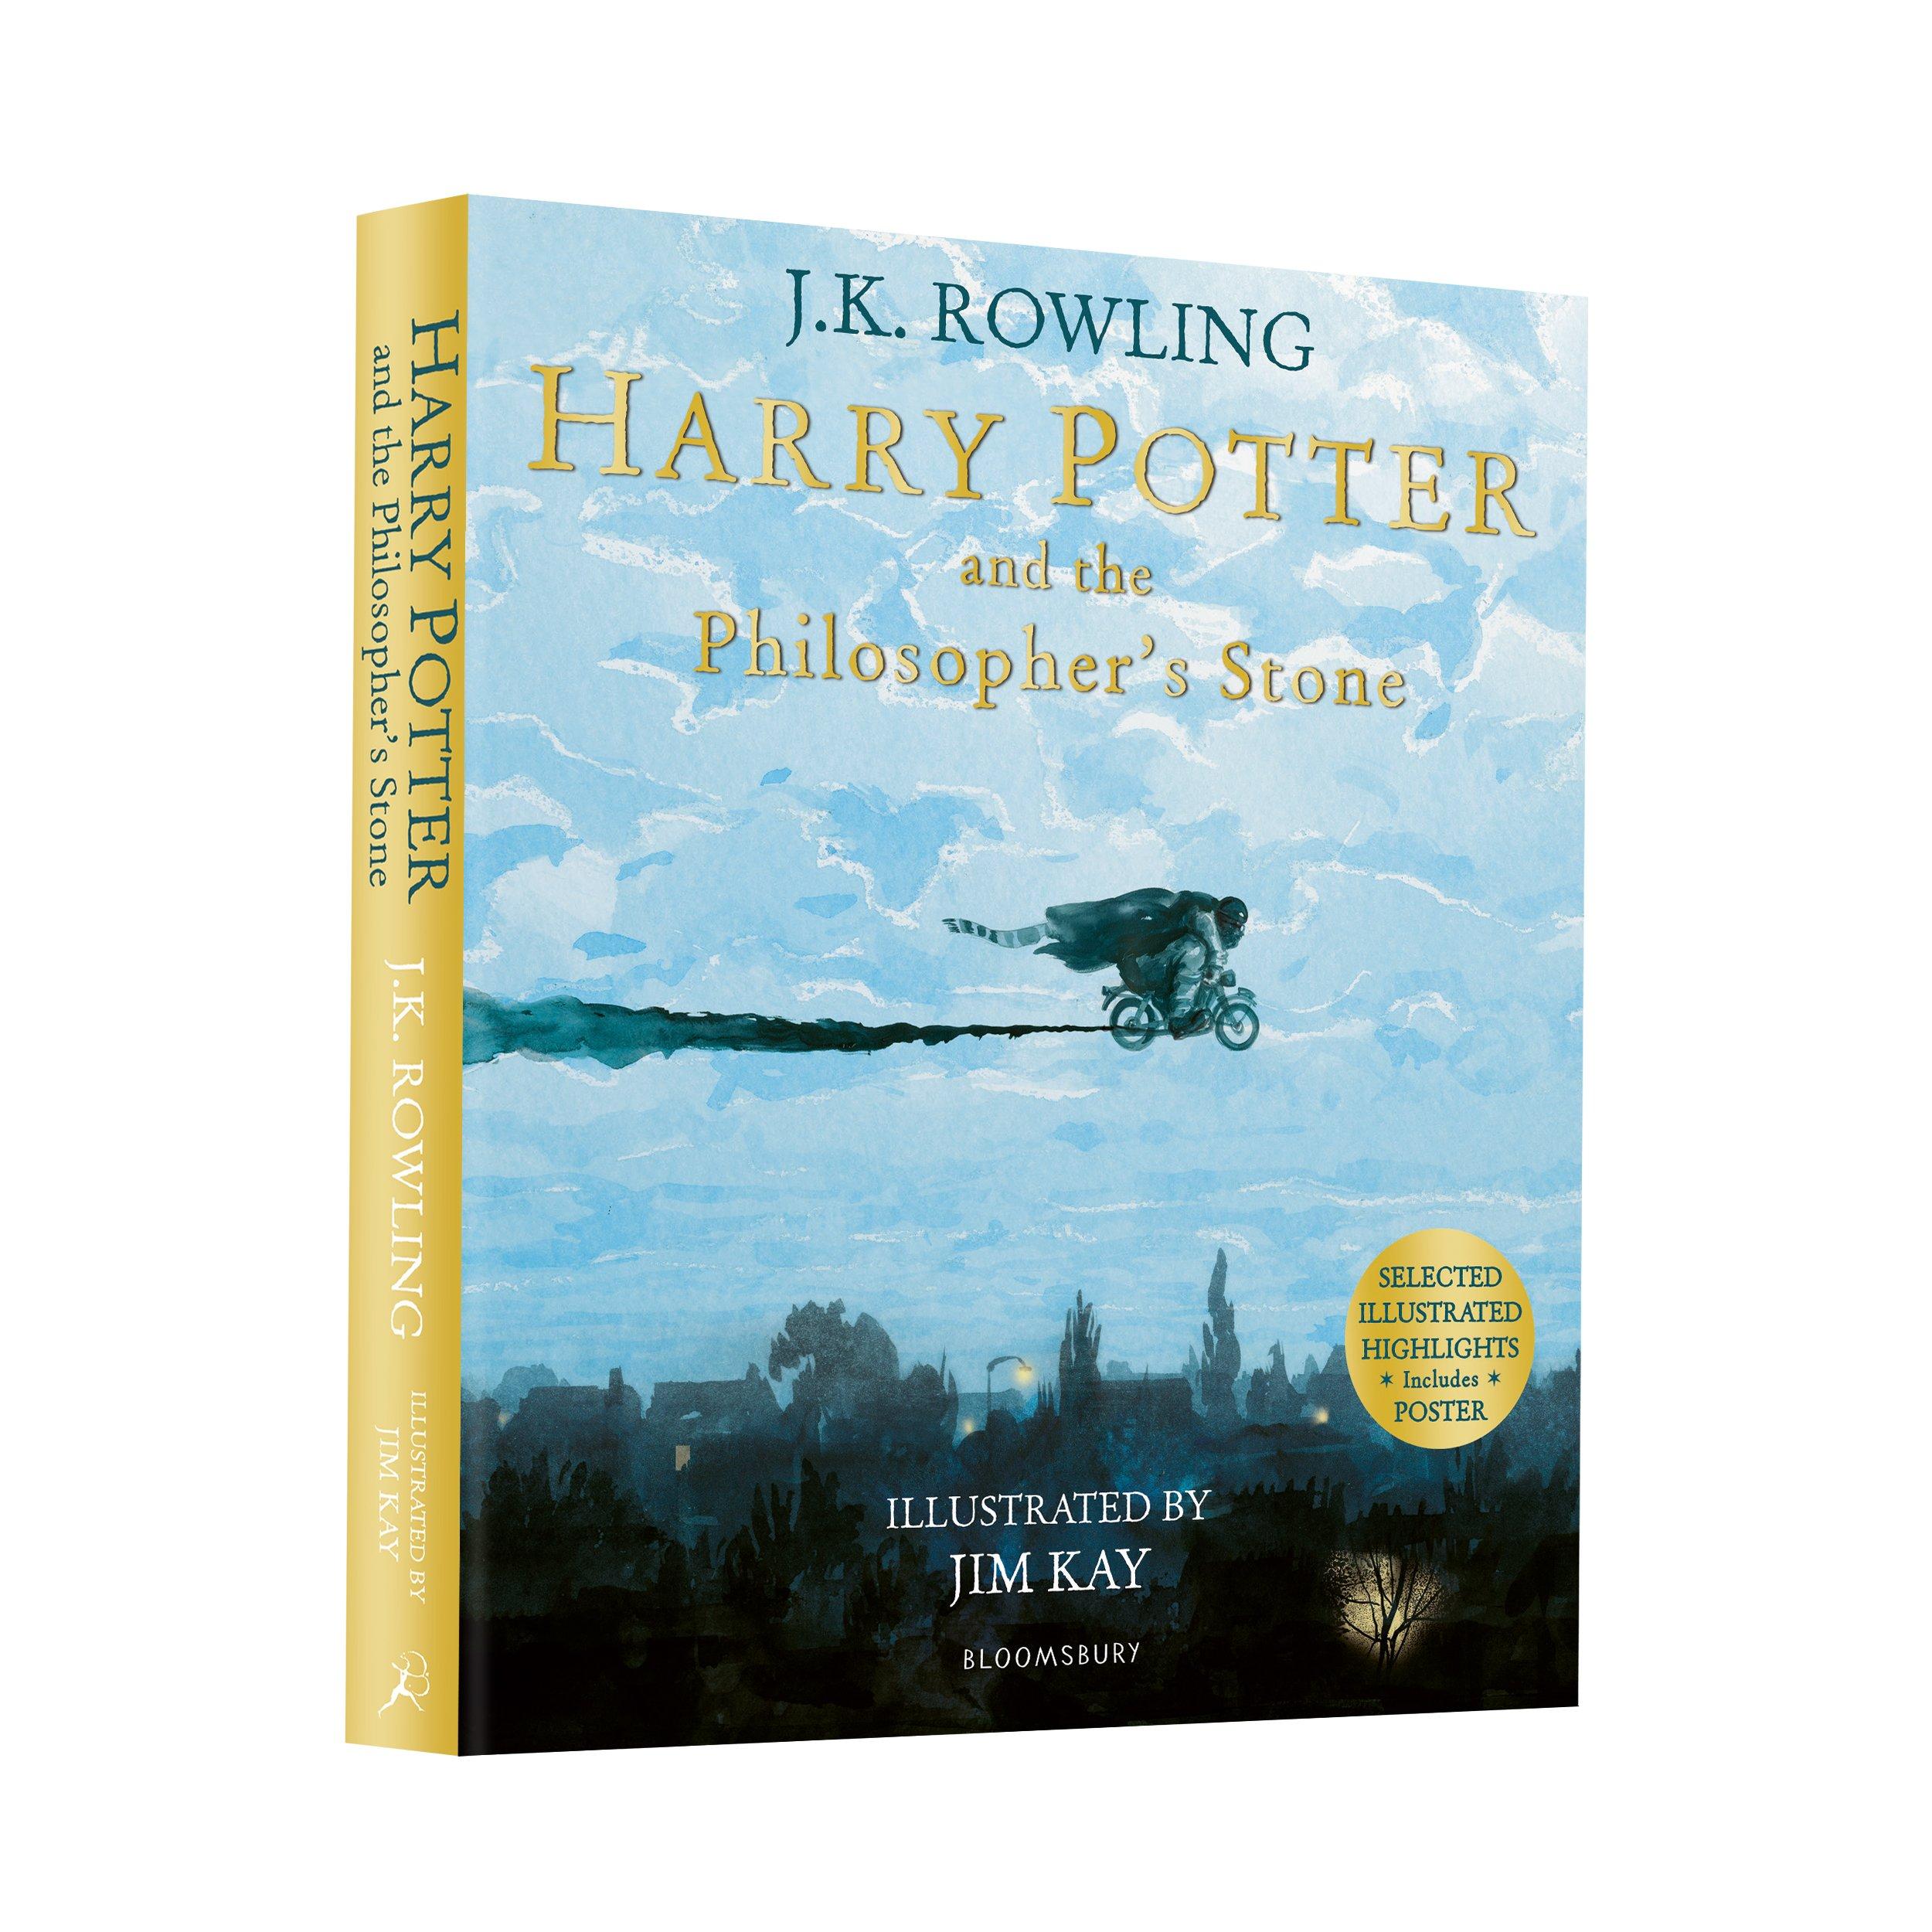 Harry Potter And The Philosopher Stone illust Harry Potter Illustrated  Edtn: Amazon.es: J K Rowling: Libros en idiomas extranjeros